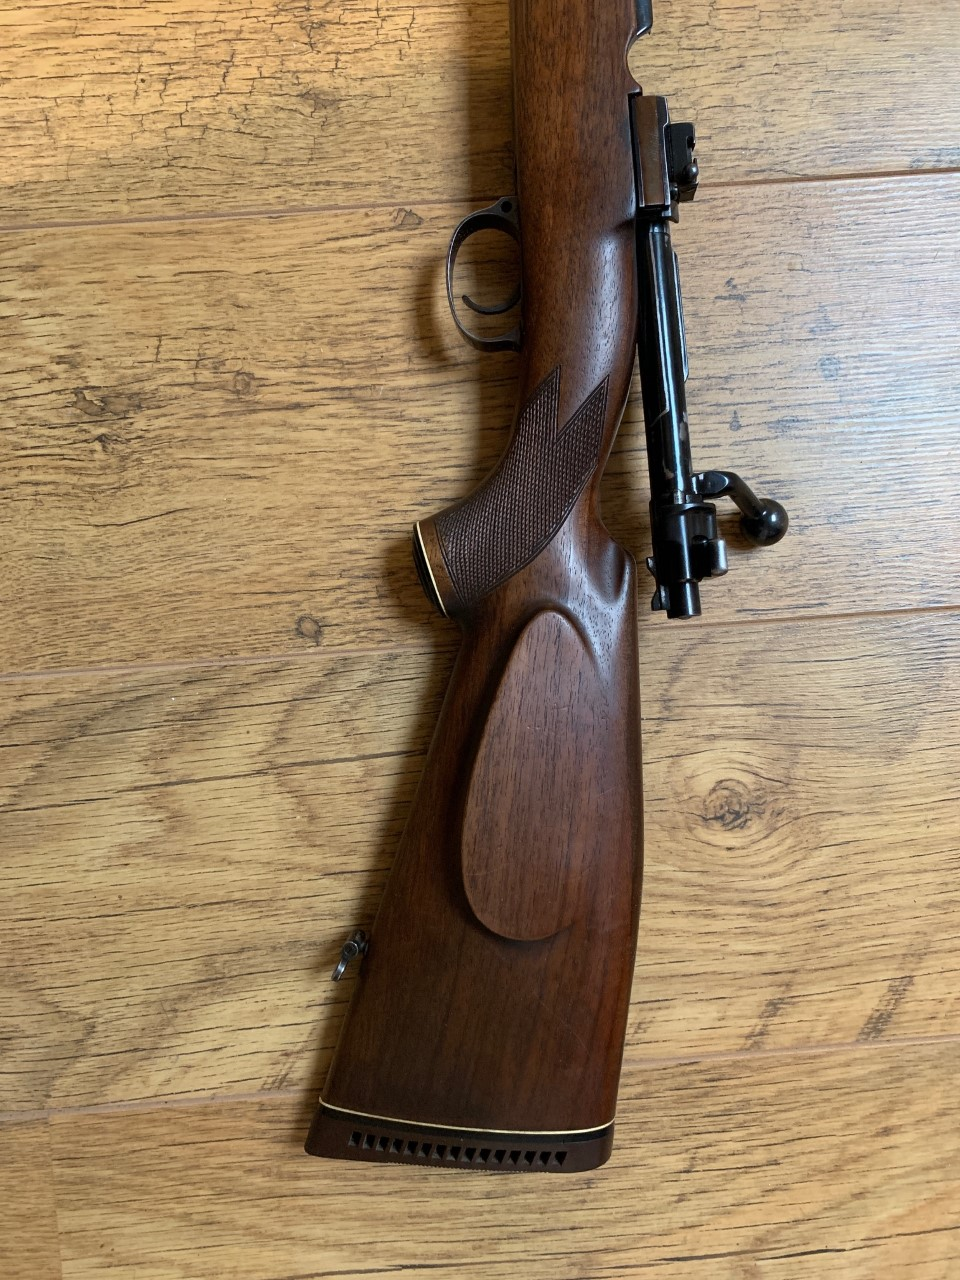 Identification carabine 7x64 Thumbn13